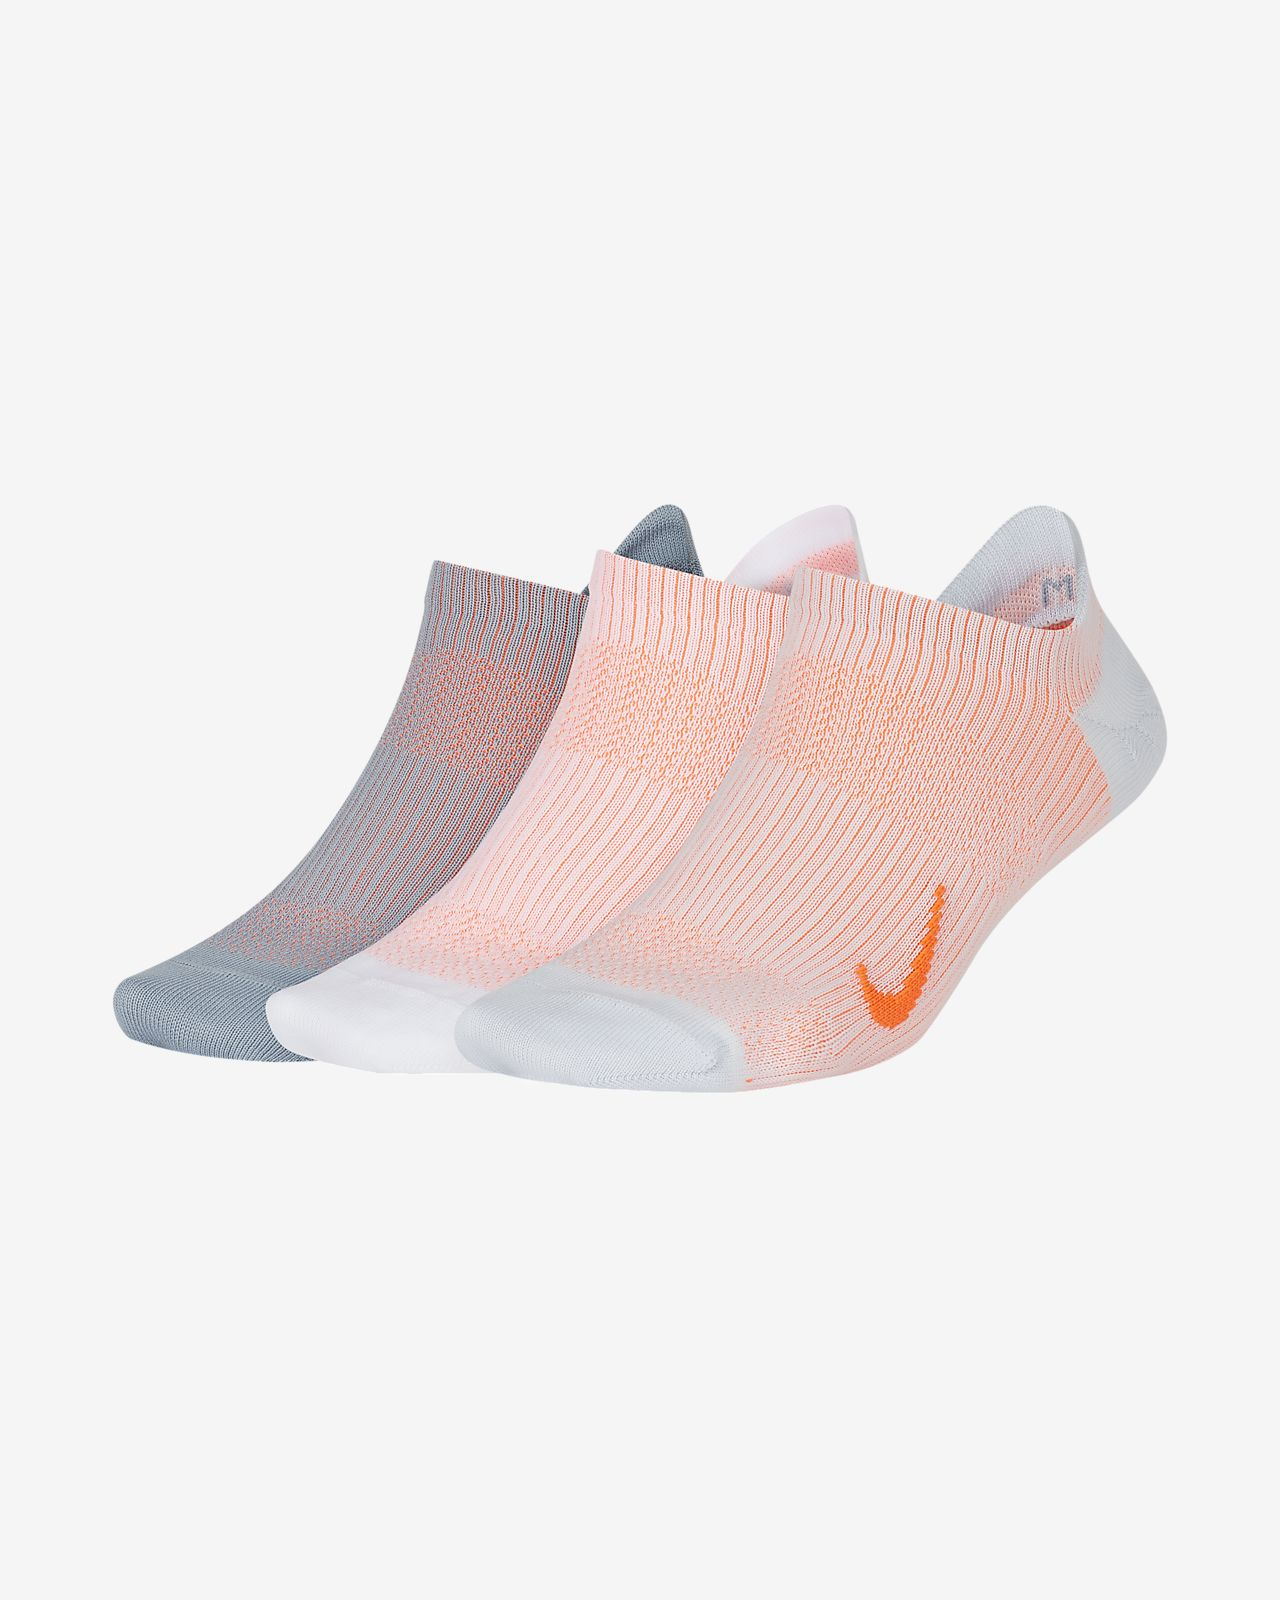 Nike Everyday Plus Lightweight Women's Training No-Show Socks (3 Pair)